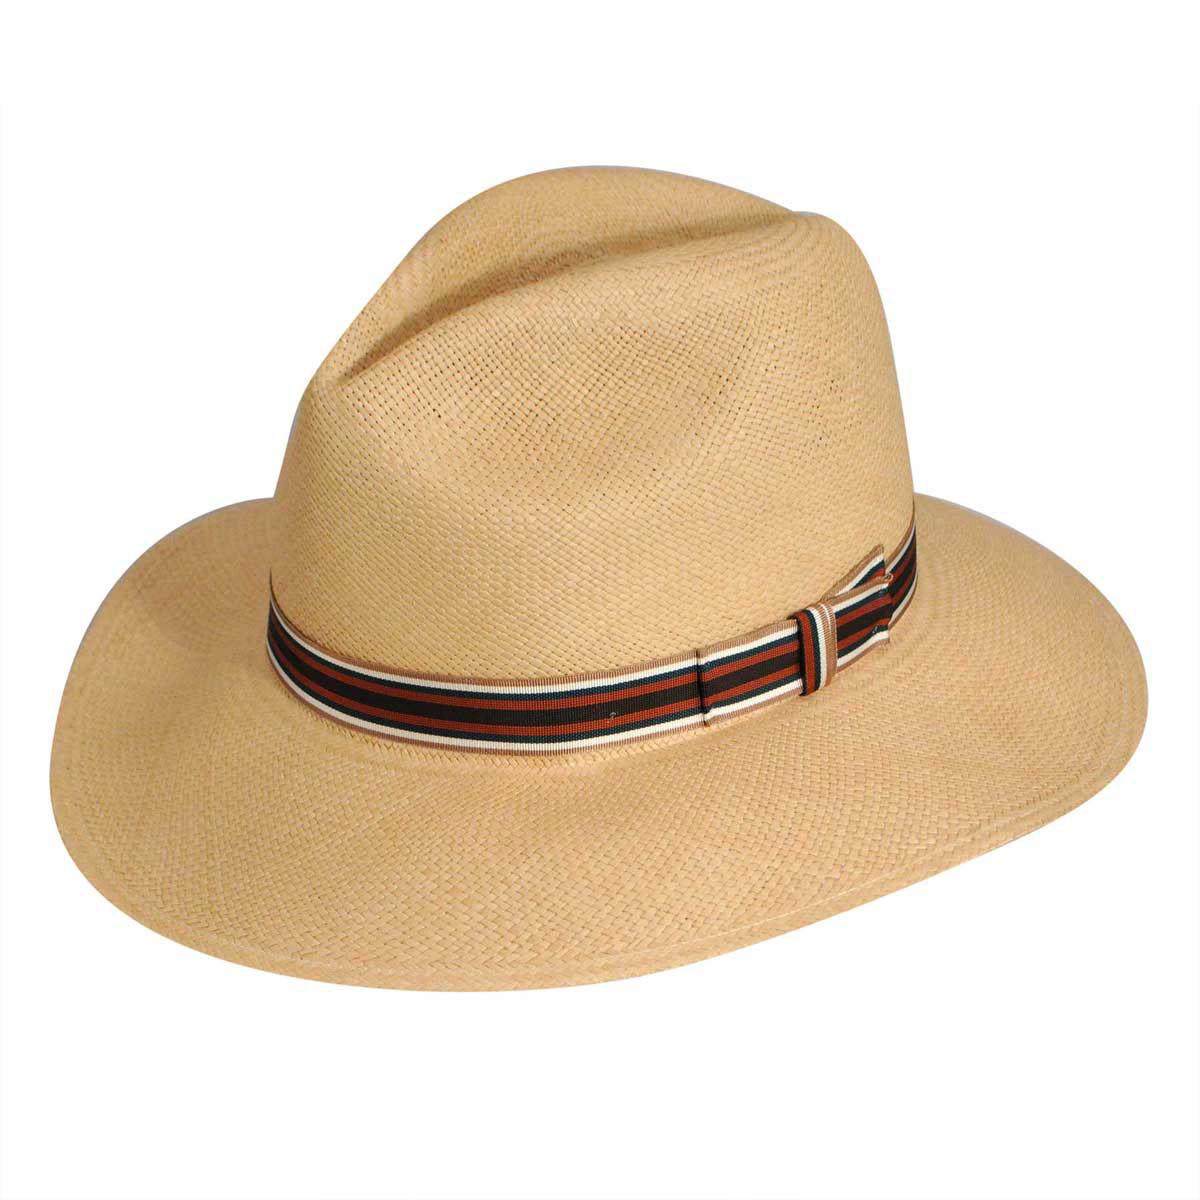 1960s -1970s Men's Clothing Benny Classic Panama $95.00 AT vintagedancer.com